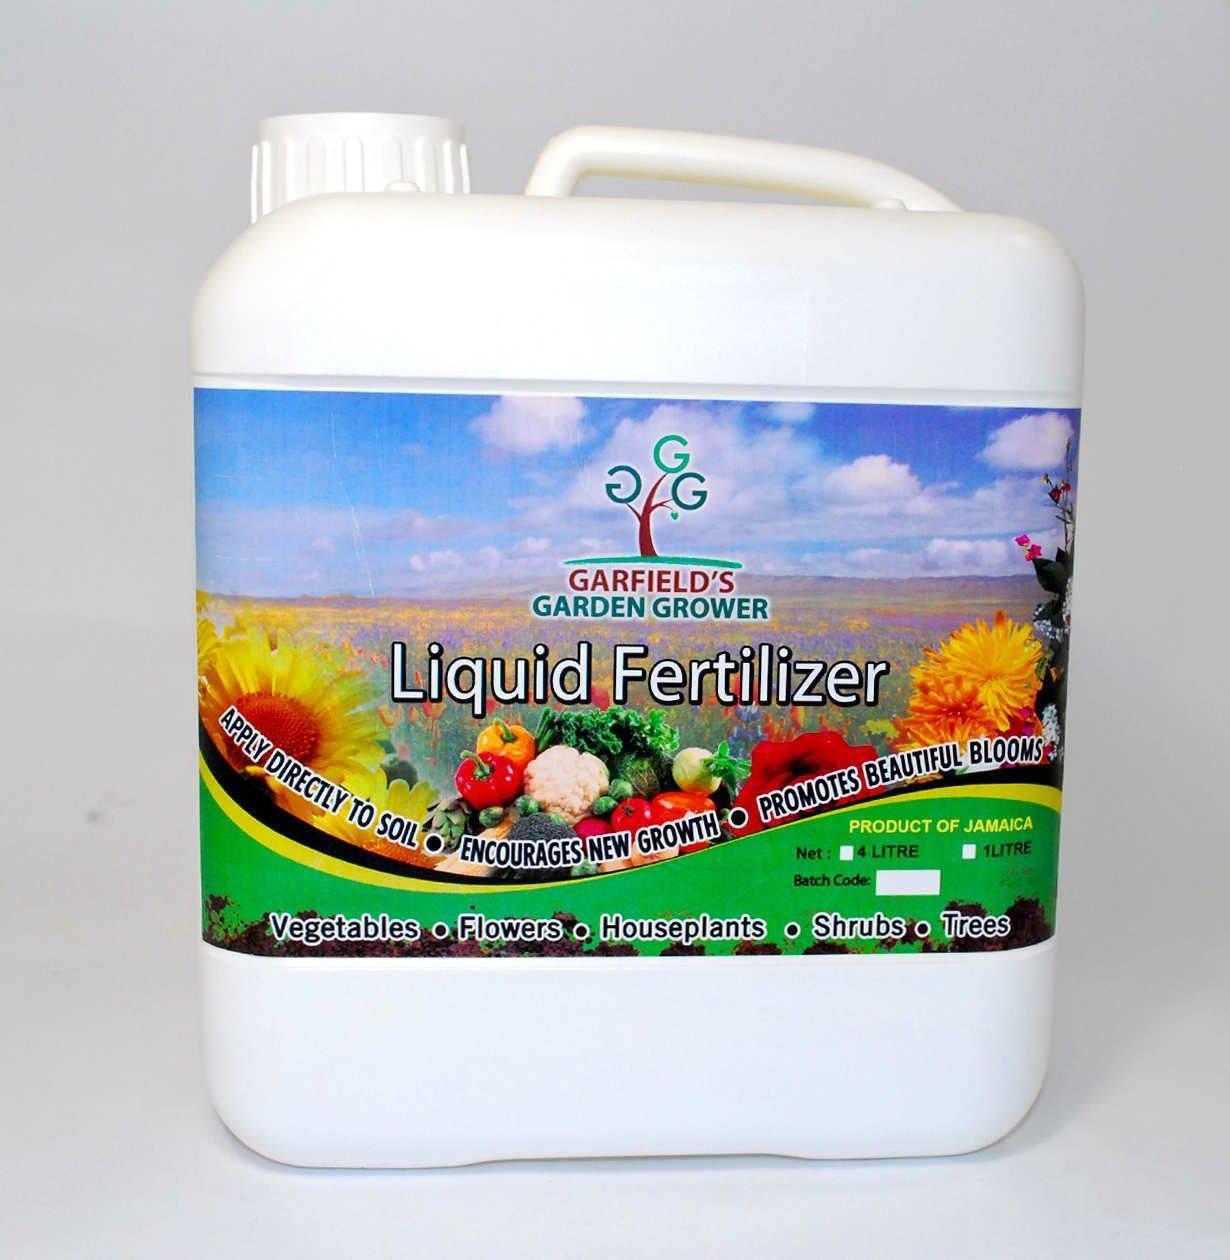 Garfield's Garden Grower 4L Liquid Fertilizer